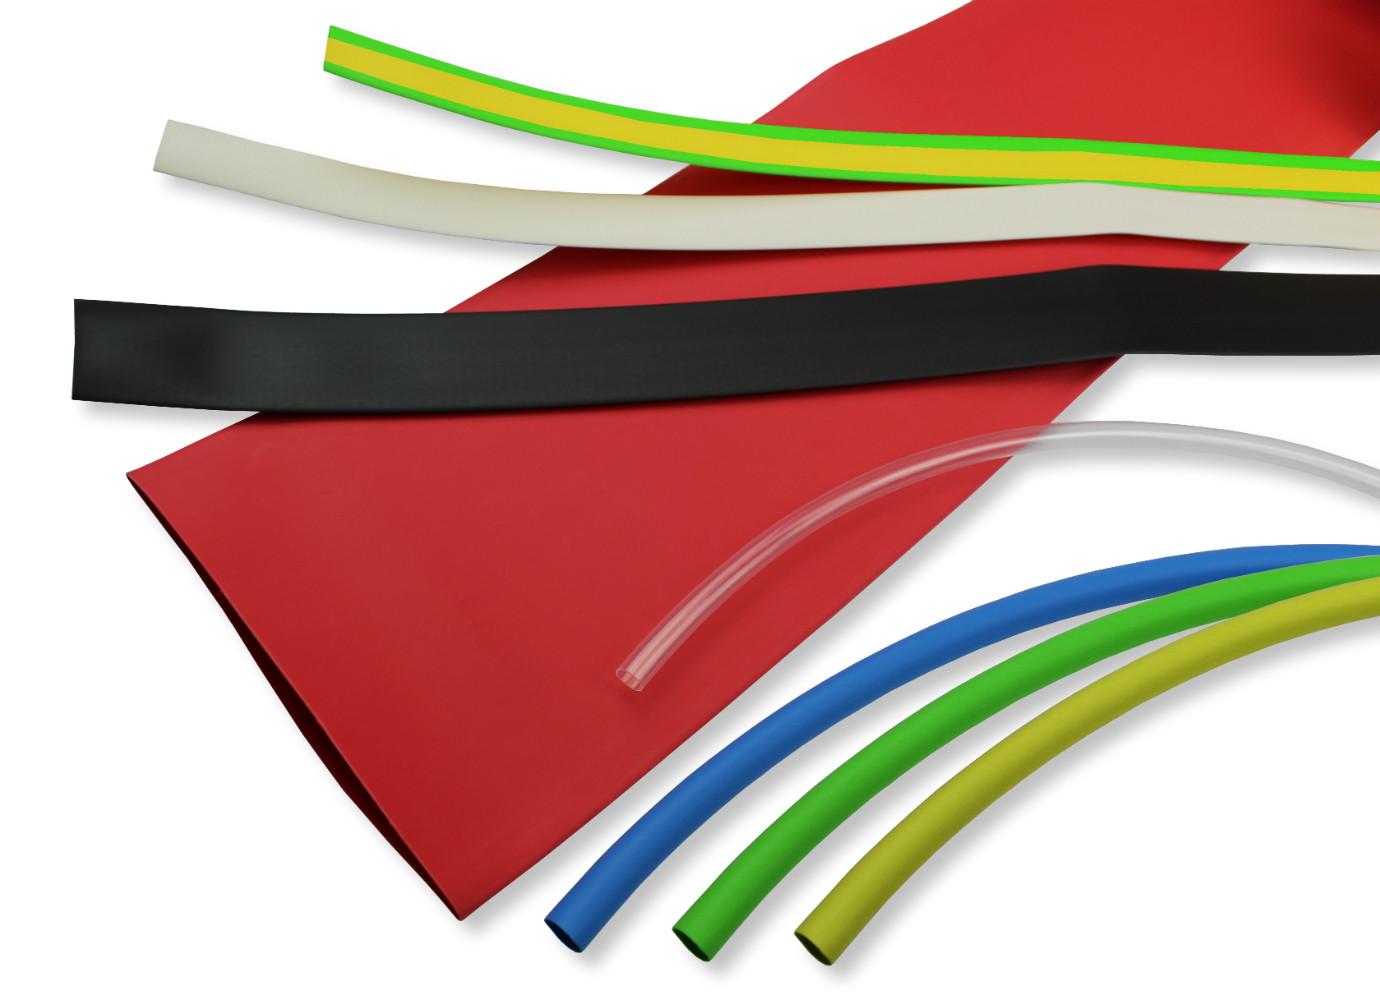 PREMIUM Heat Shrink Tubing 3:1 Ratio HSP3 size 24.0mm I.D / 8.0mm I.D Red